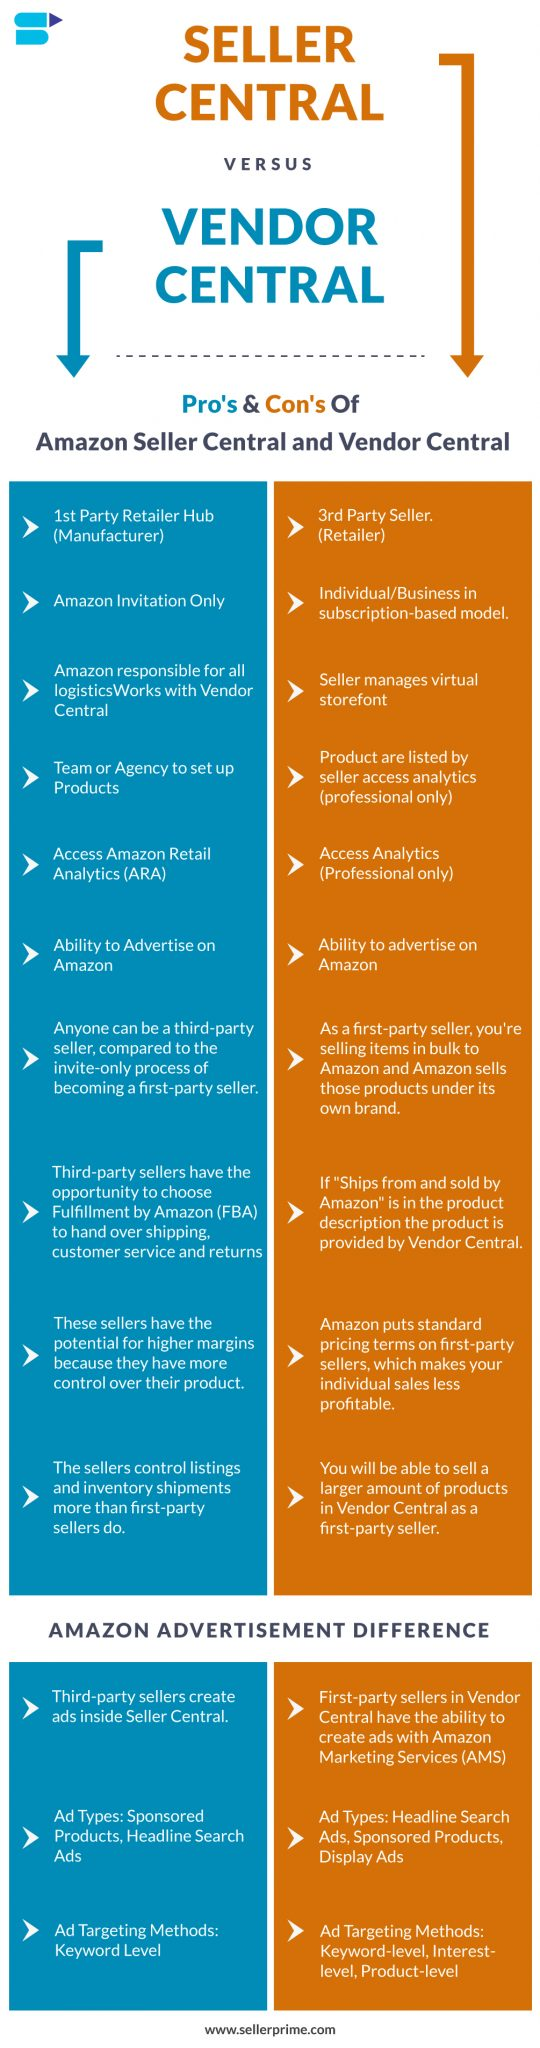 Amazon Seller Central Vs Vendor Central Difference Info-graphics